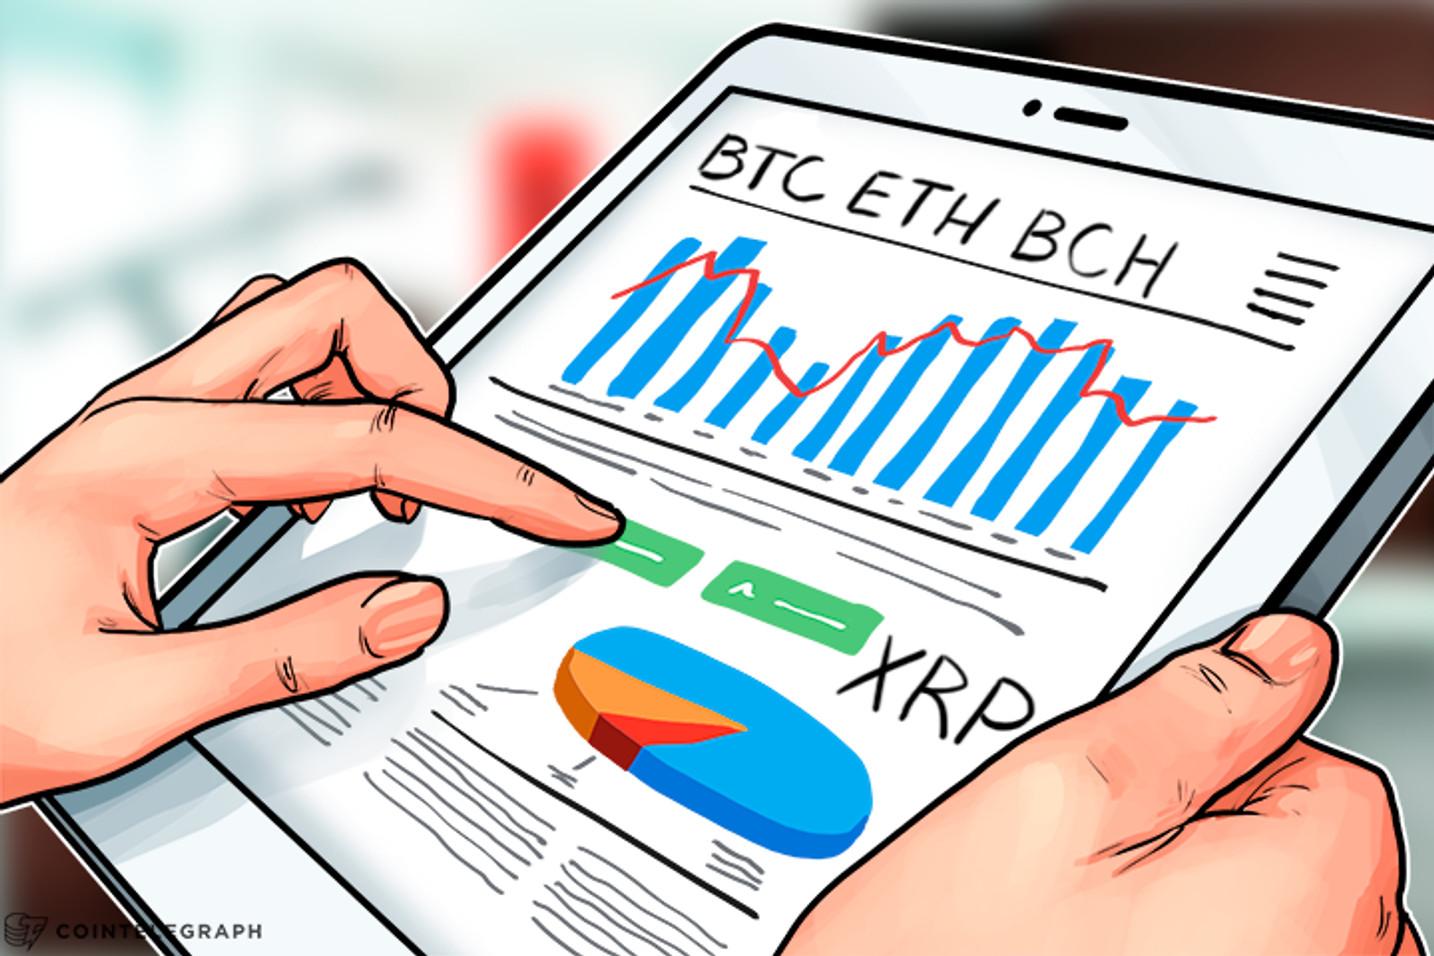 Bitcoin, Ethereum, Bitcoin Cash, Ripple: Price Analysis, August 18